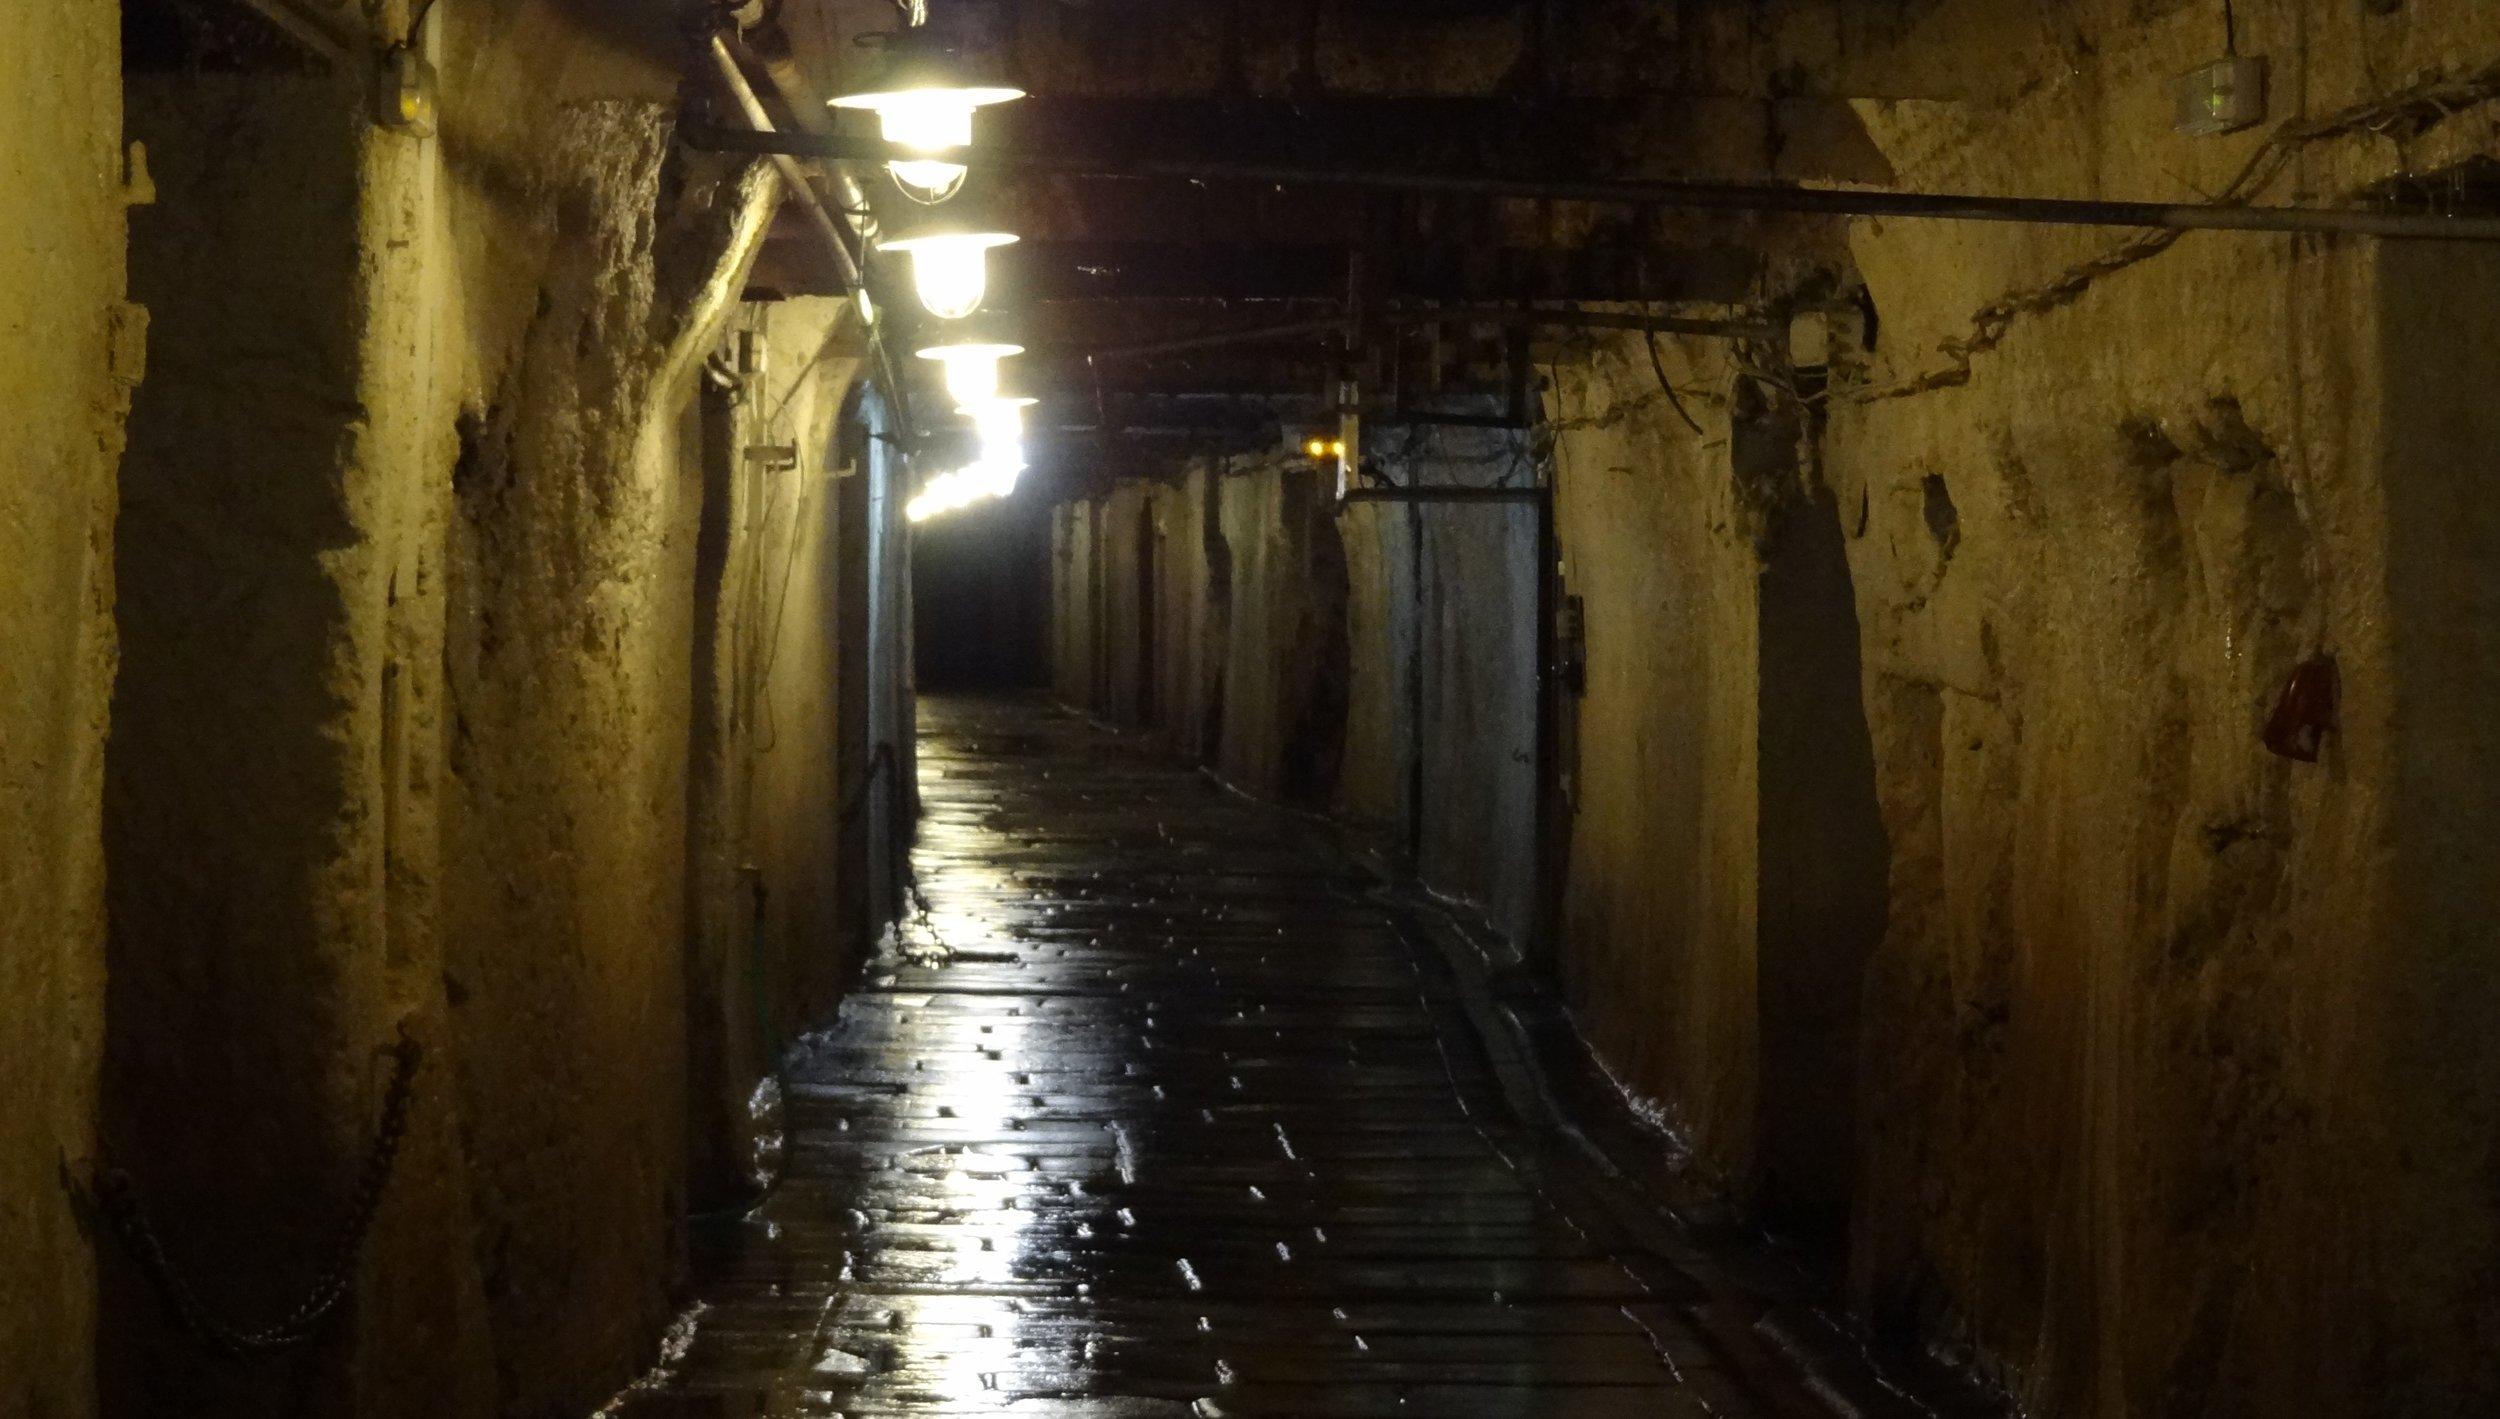 Miles of cellars still honeycomb the ground underneath Pilsner Urquell.